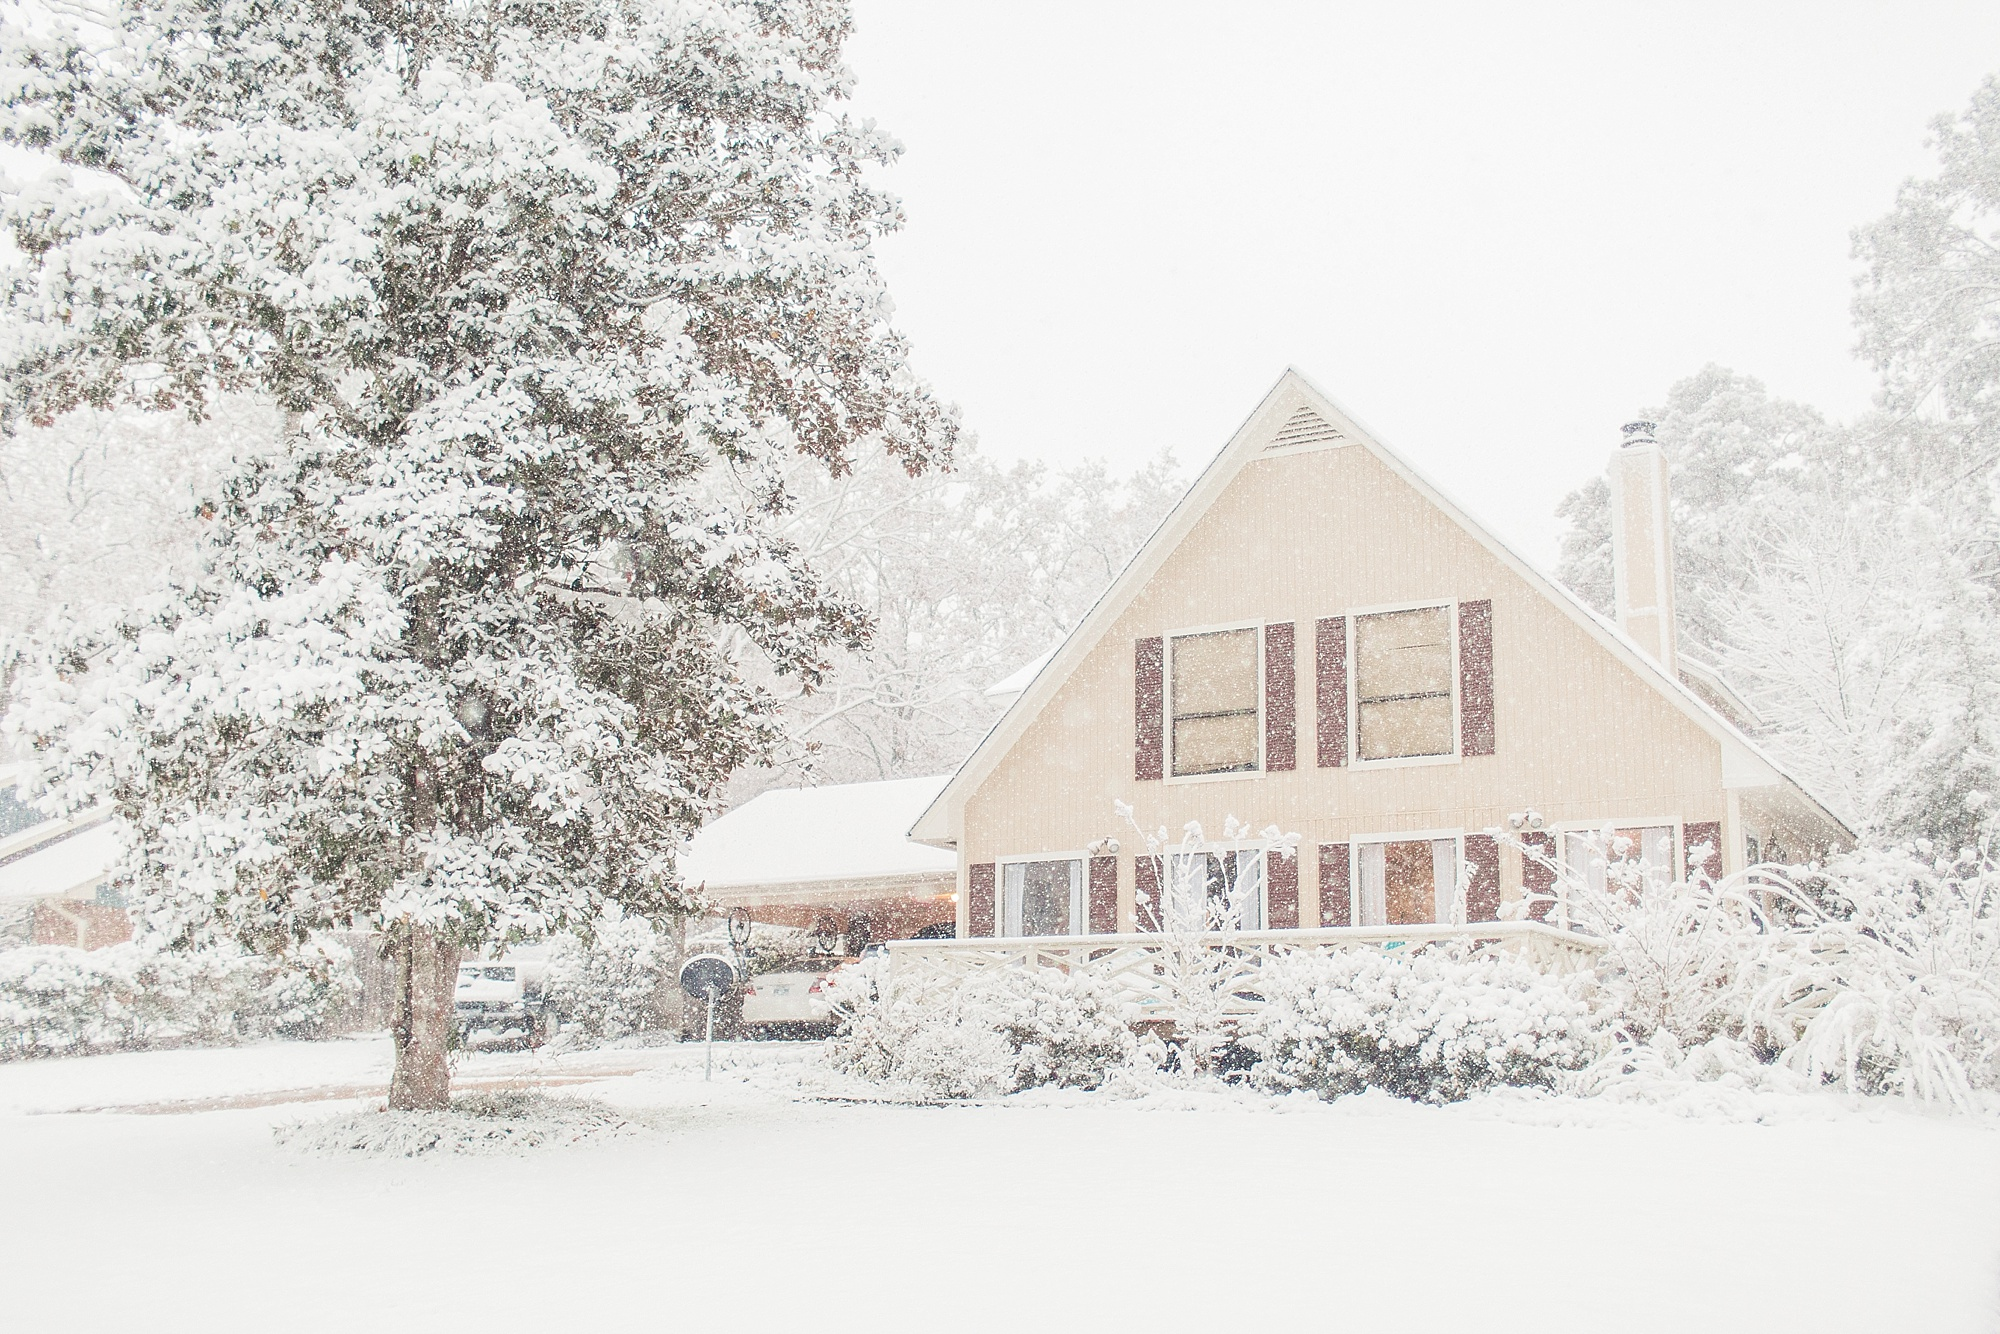 mississippi-snow-day_0002.jpg